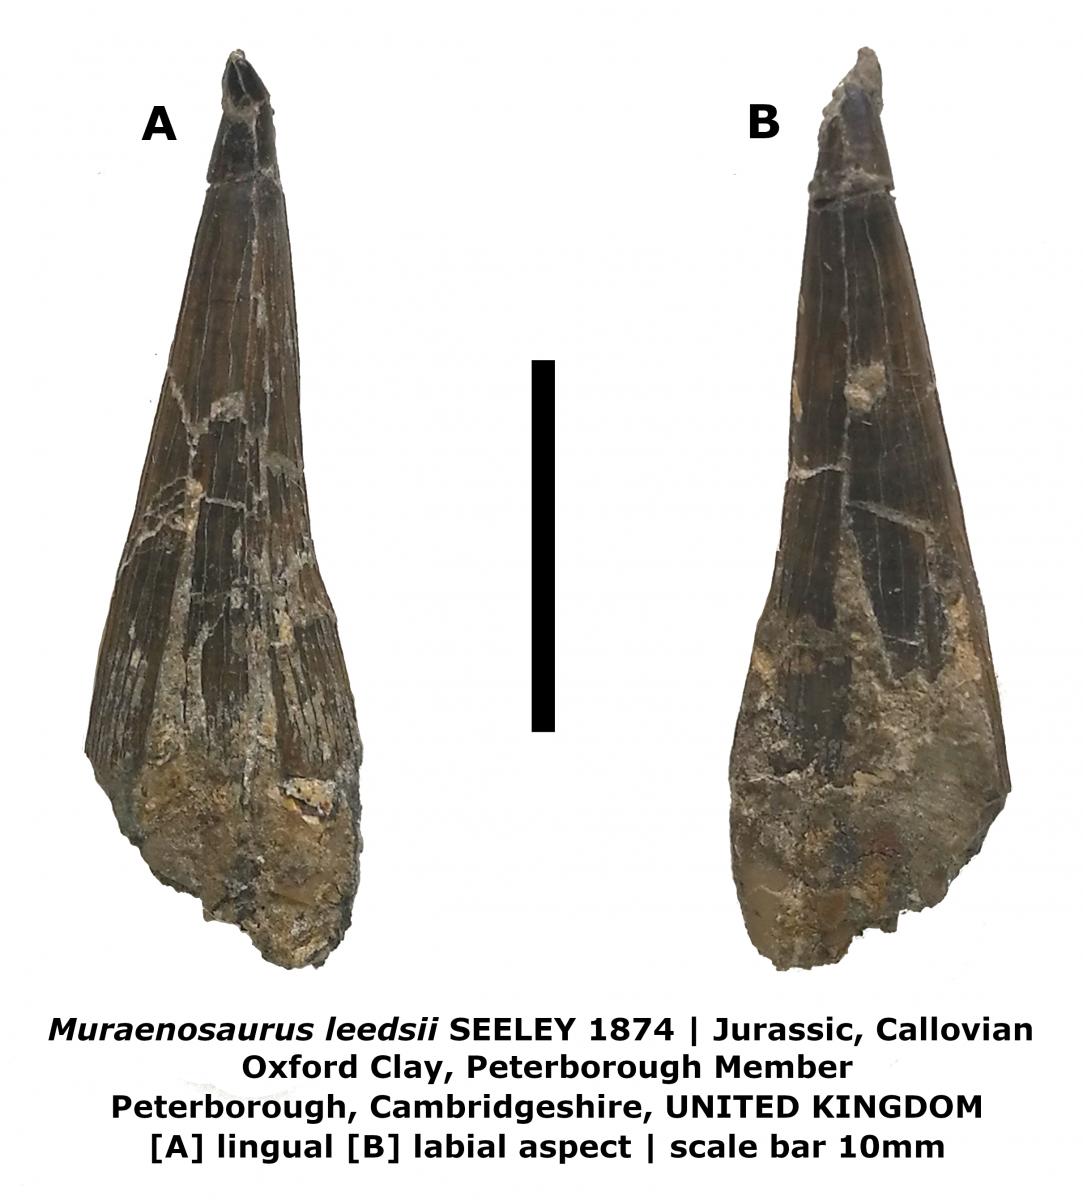 Muraenosaurus leedsii